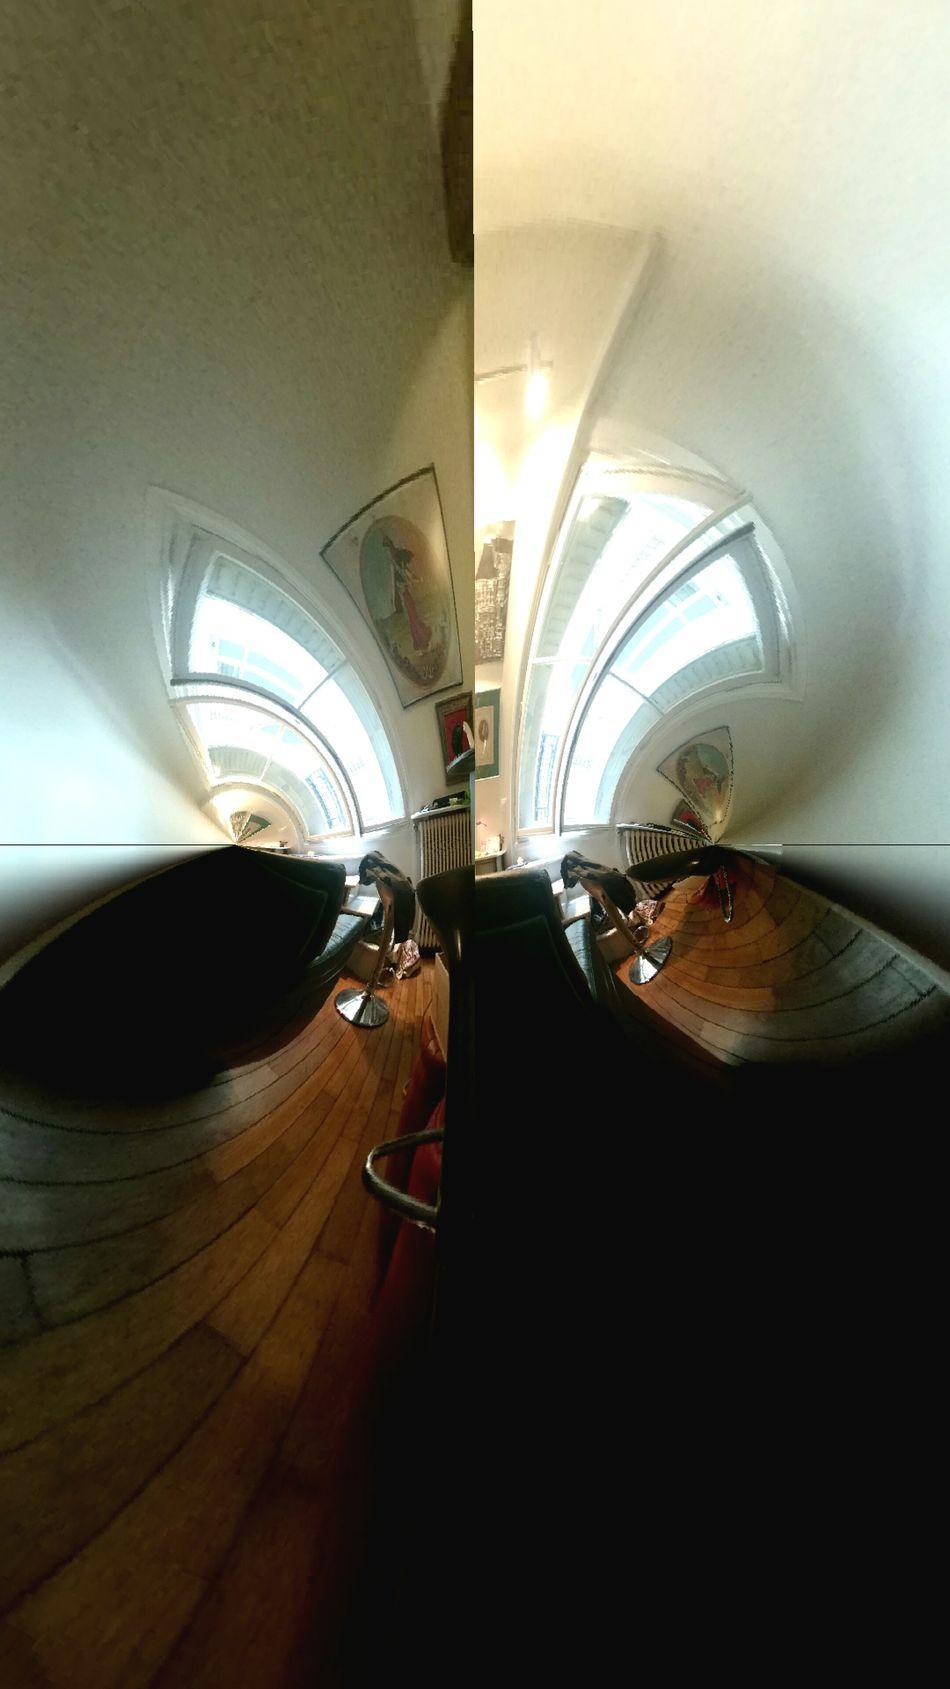 Franc_paris In My Home